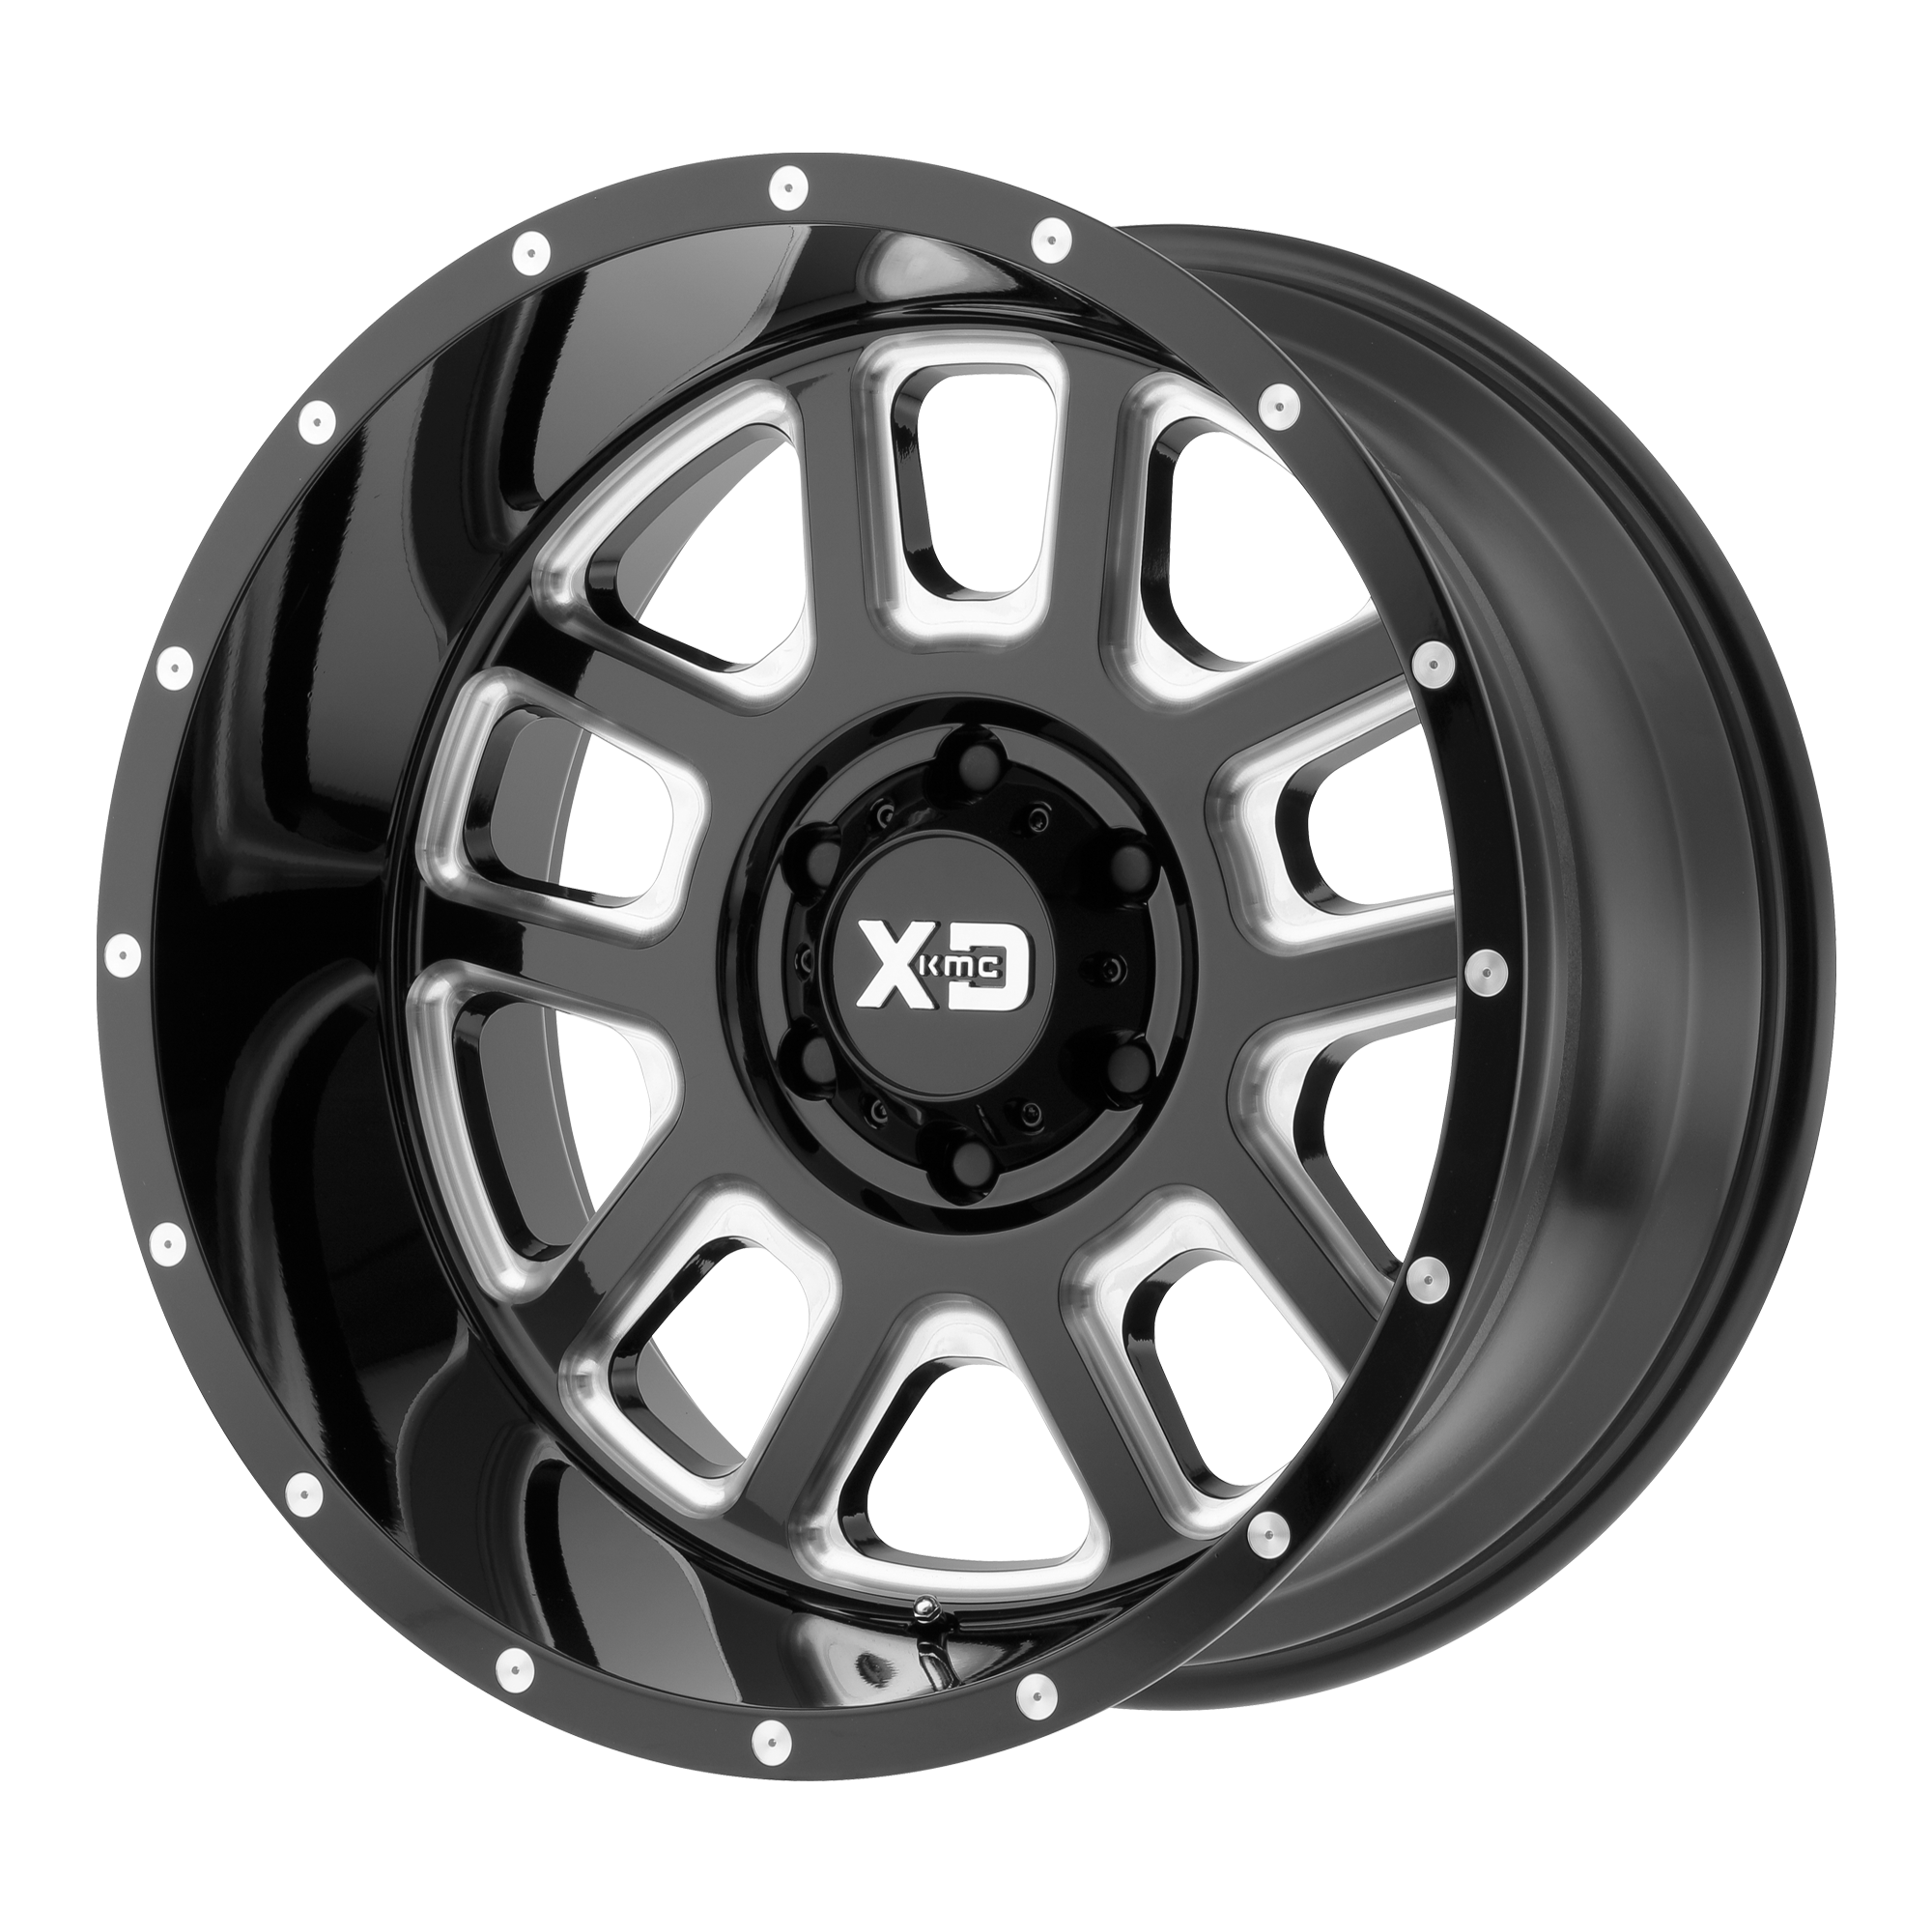 XD SERIES XD828 DELTA hliníkové disky 9x20 5x127 ET-12 Gloss Black Milled